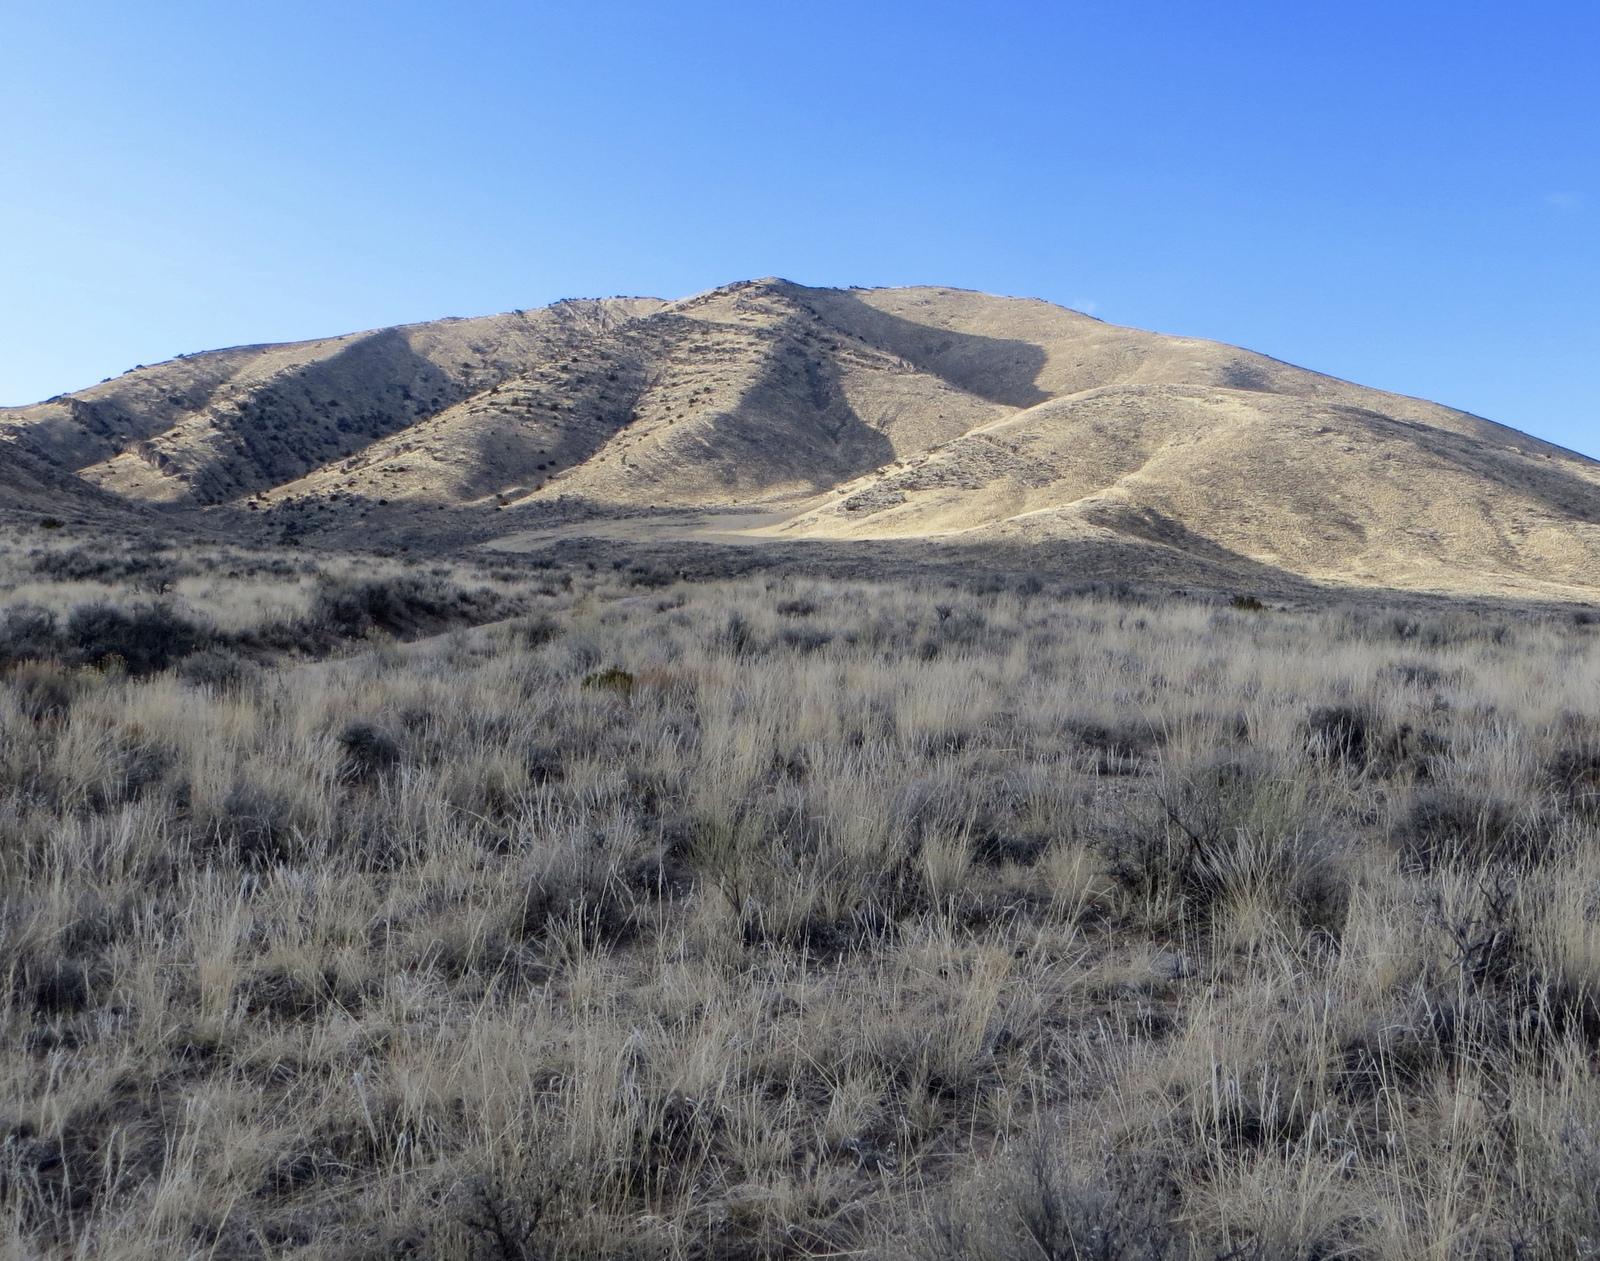 Peak 7194 (left back) and Peak 6990 (front center). Steve Mandella photo.